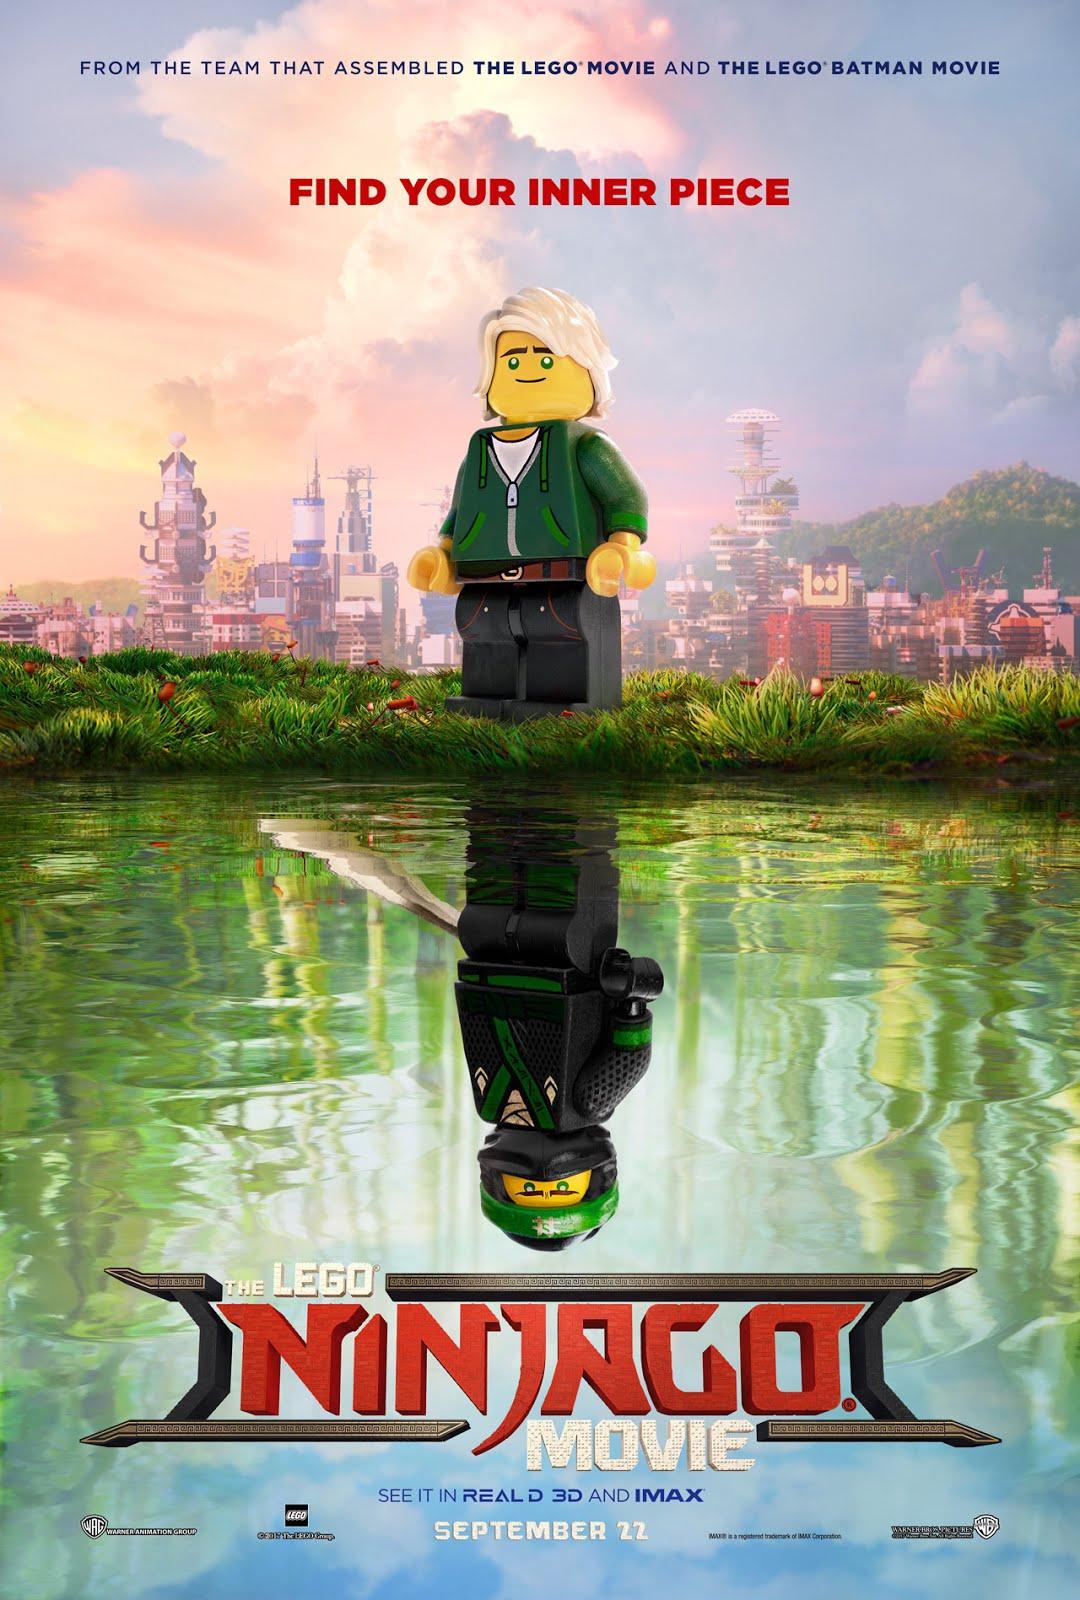 The Lego Ninjago Movie Trailer Is Finally Here!